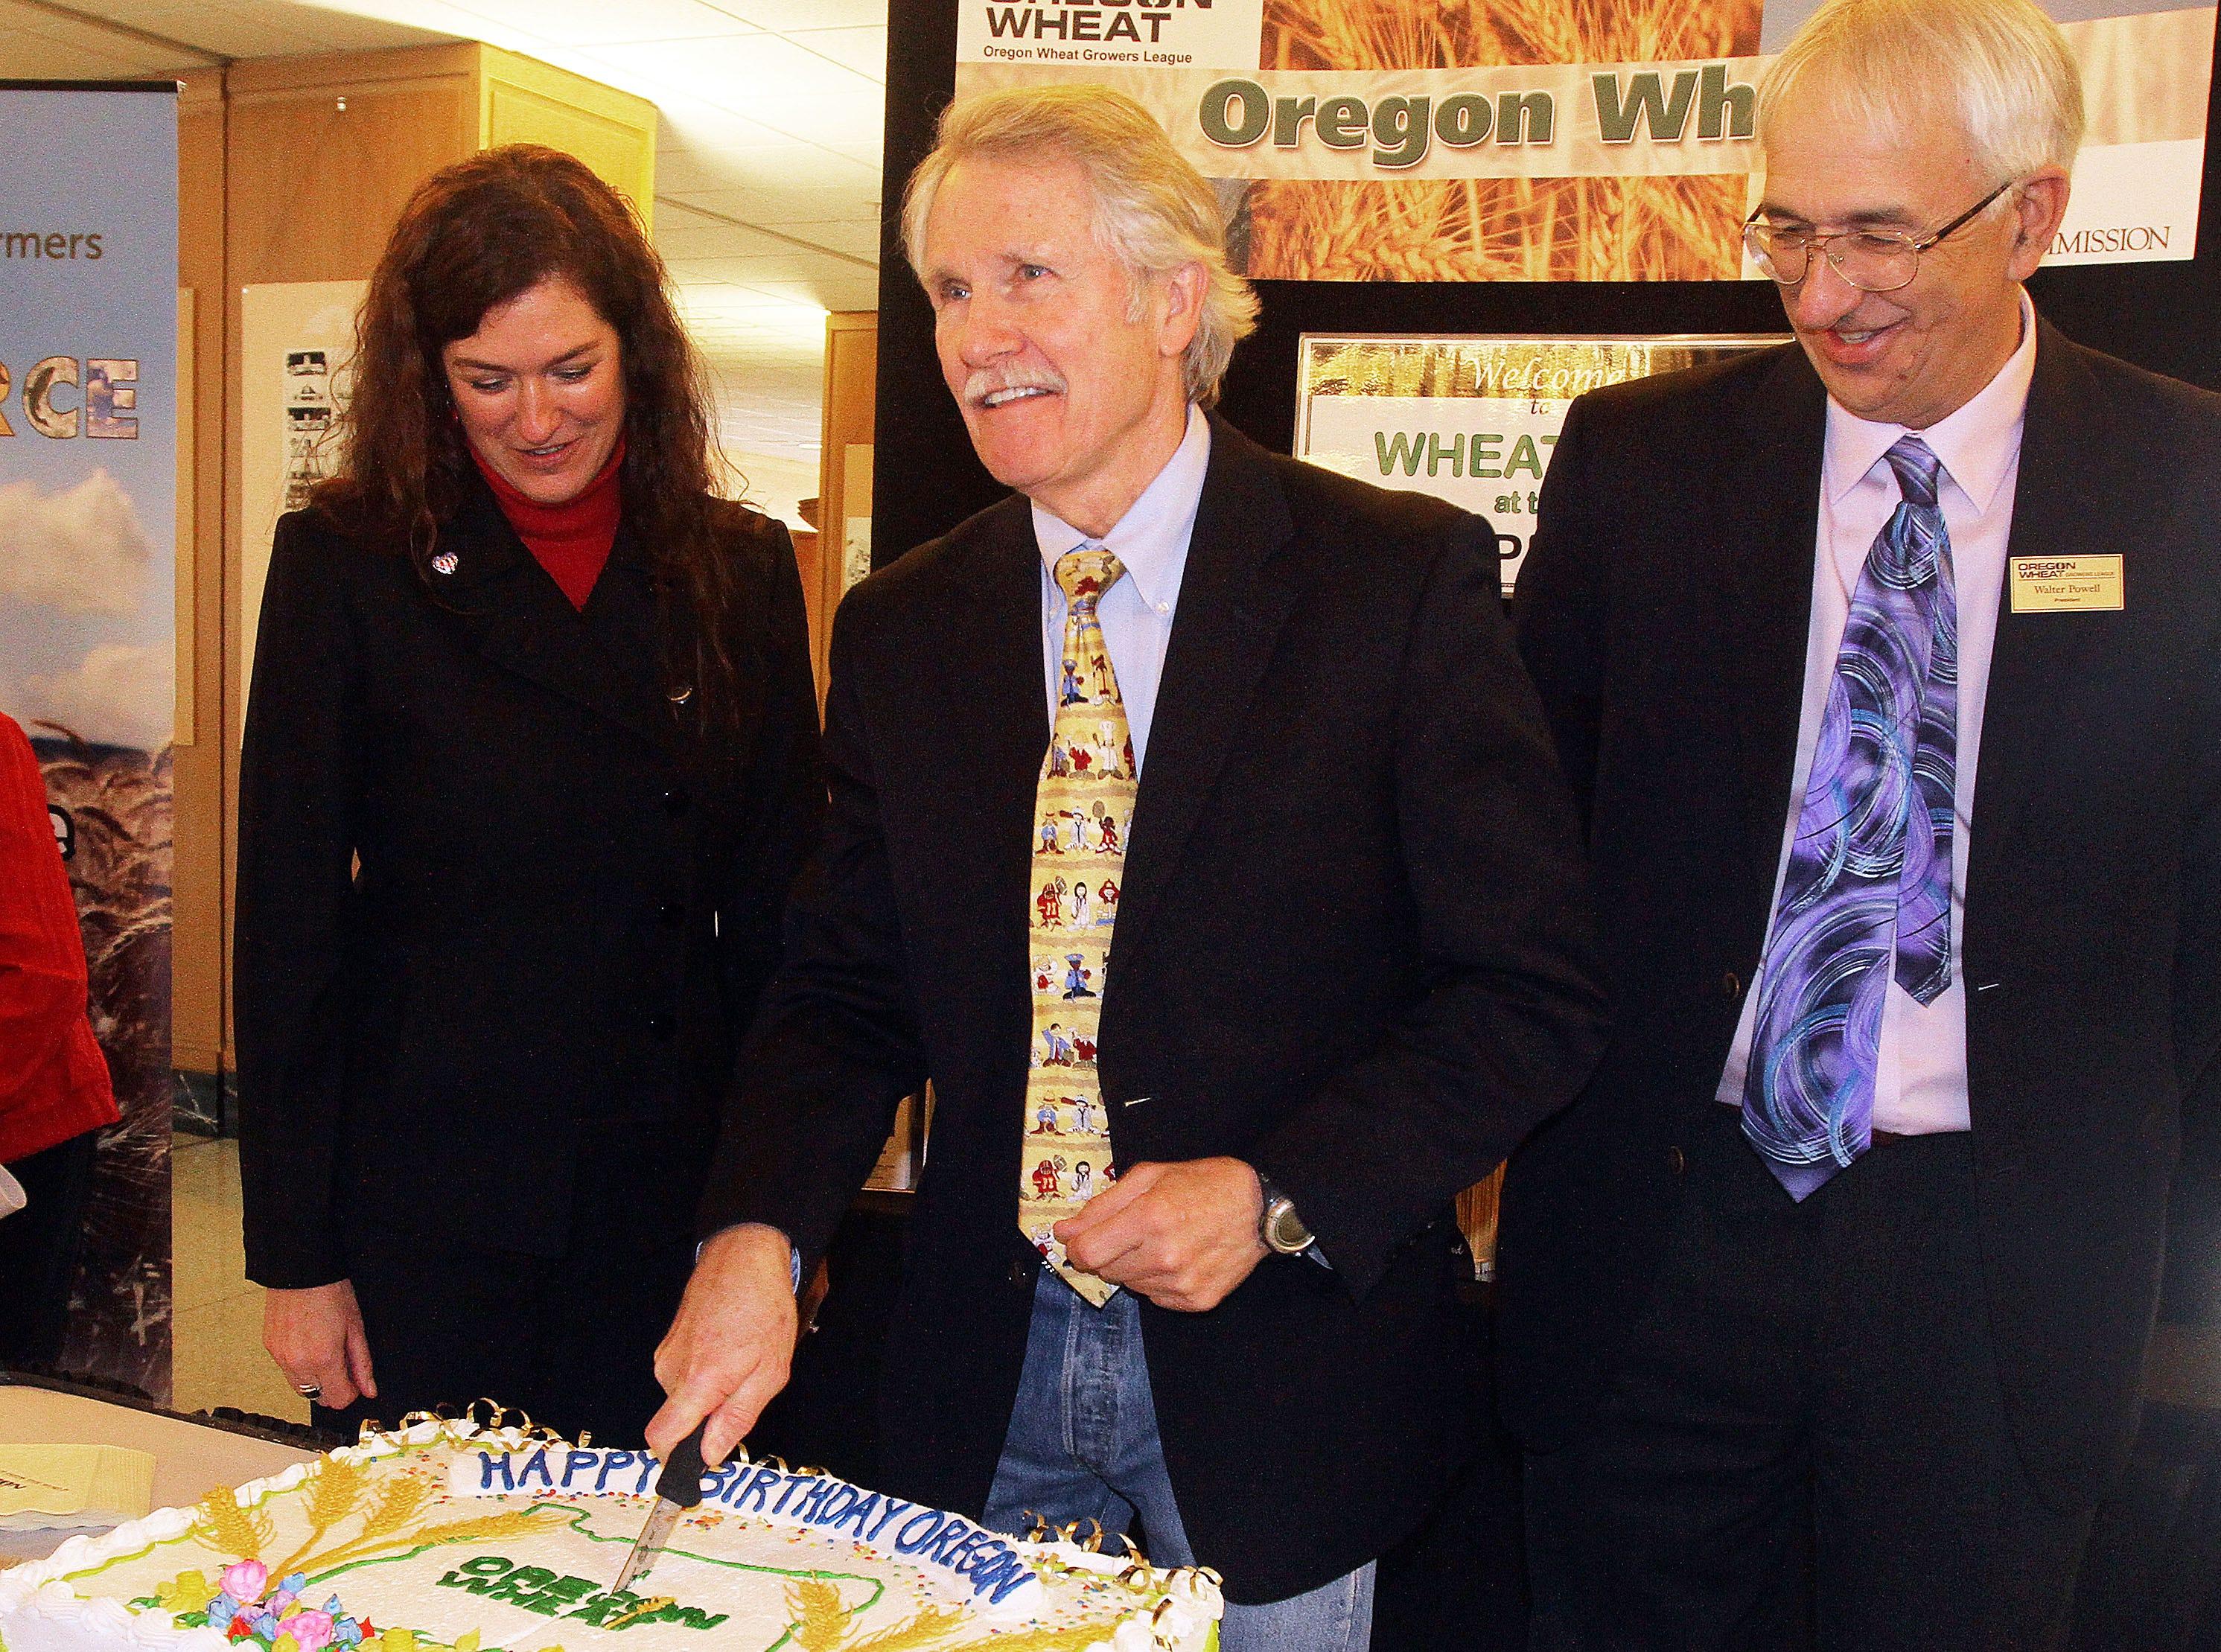 Gov. John Kitzhaber cuts Oregon's 154th birthday cake on Feb. 14, 2013.